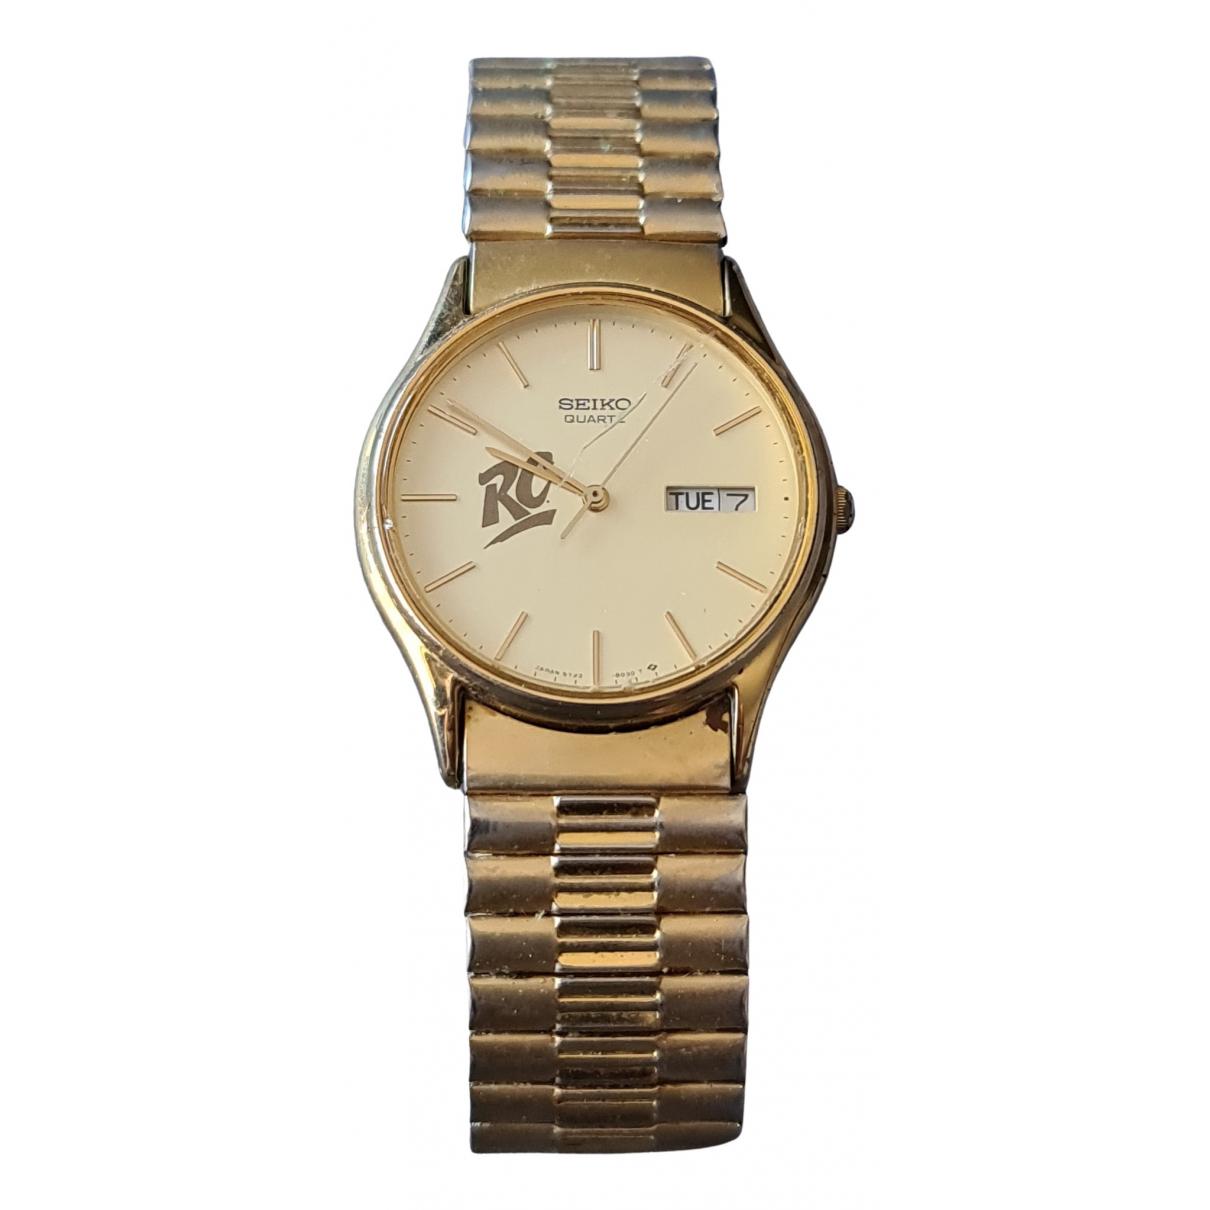 Seiko \N Uhr in  Gold Vergoldet